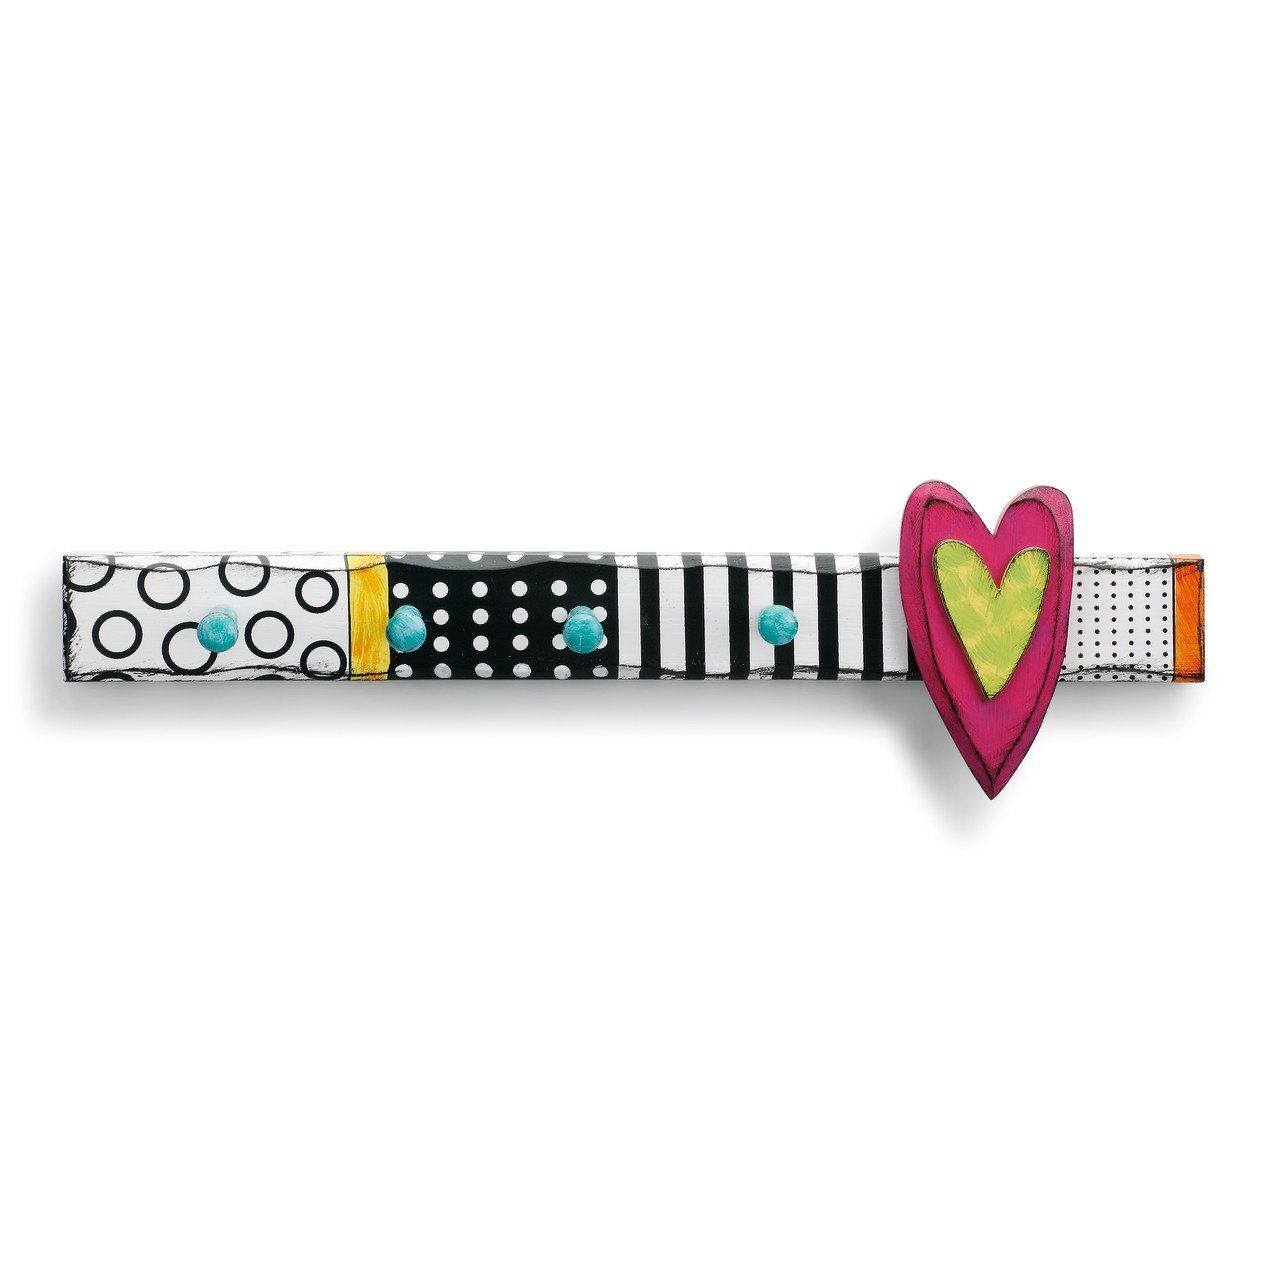 DEMDACO Heart Design Multicolored 22 x 7 Fir Wood and Composite Bath Towel Wall Hooks 1004380021